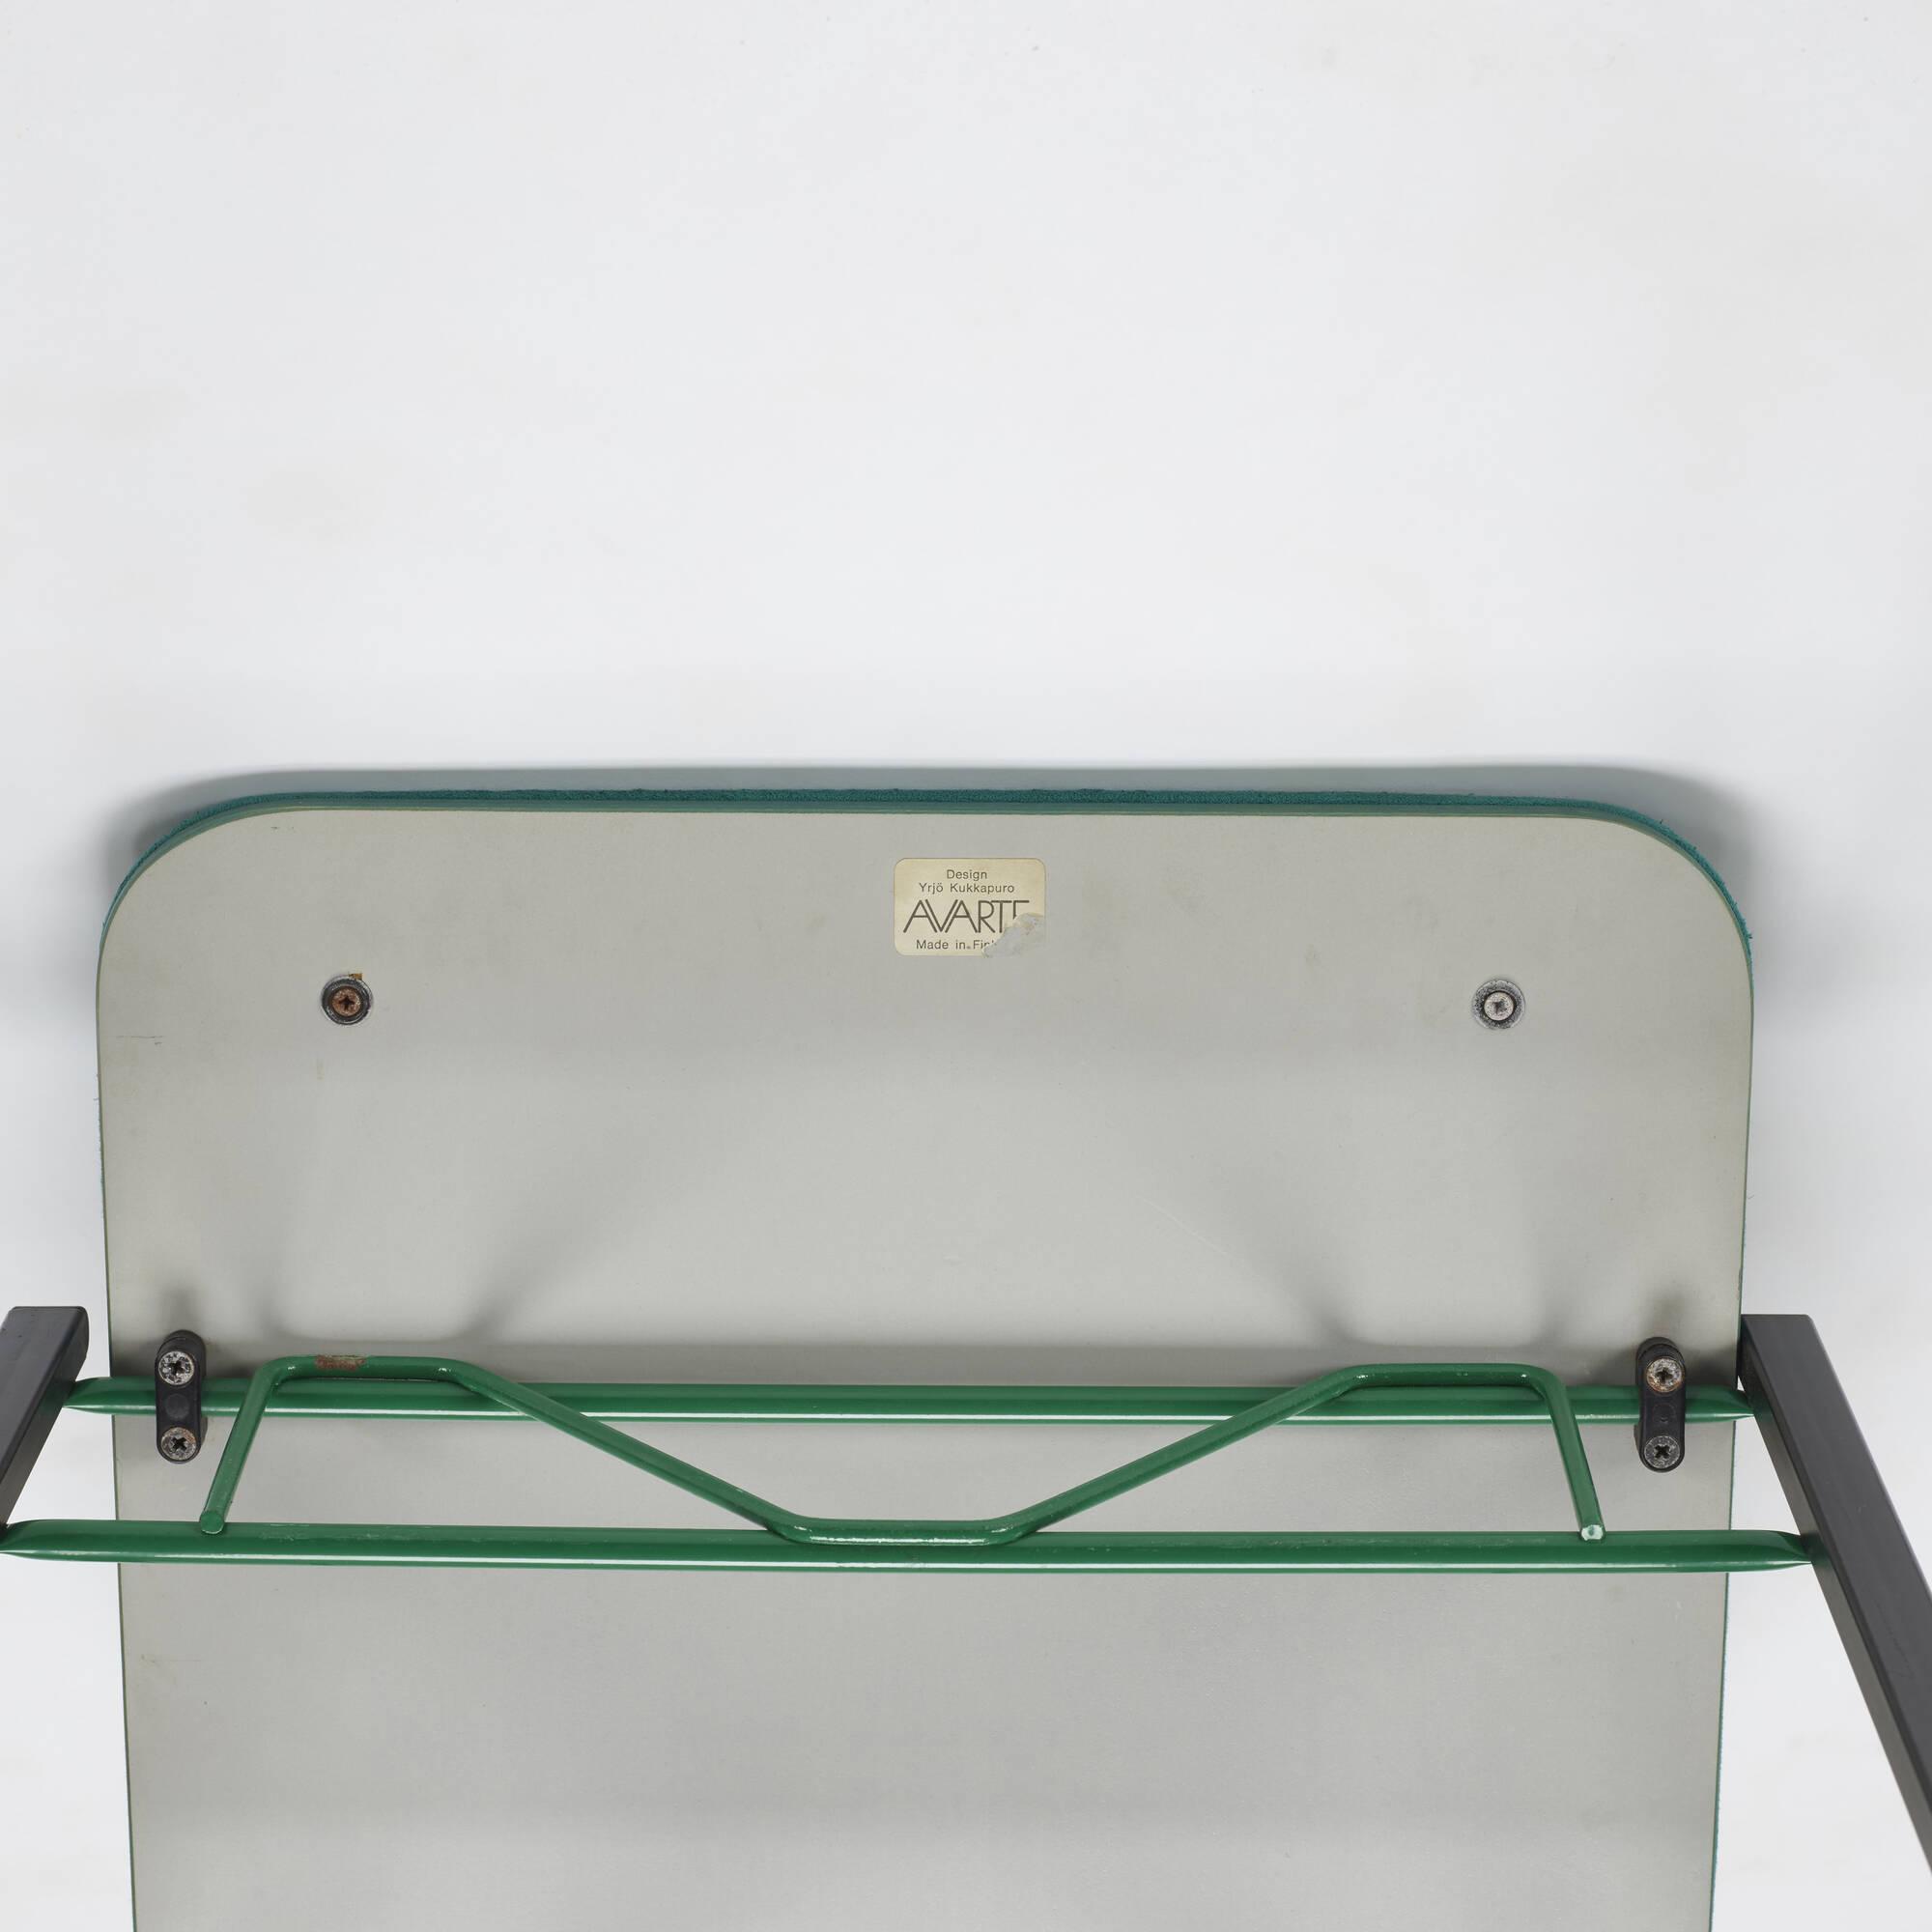 fashionable design teal dining chairs.  444 Yrj Kukkapuro A500 dining chairs set of six 5 YRJ KUKKAPURO Art Design